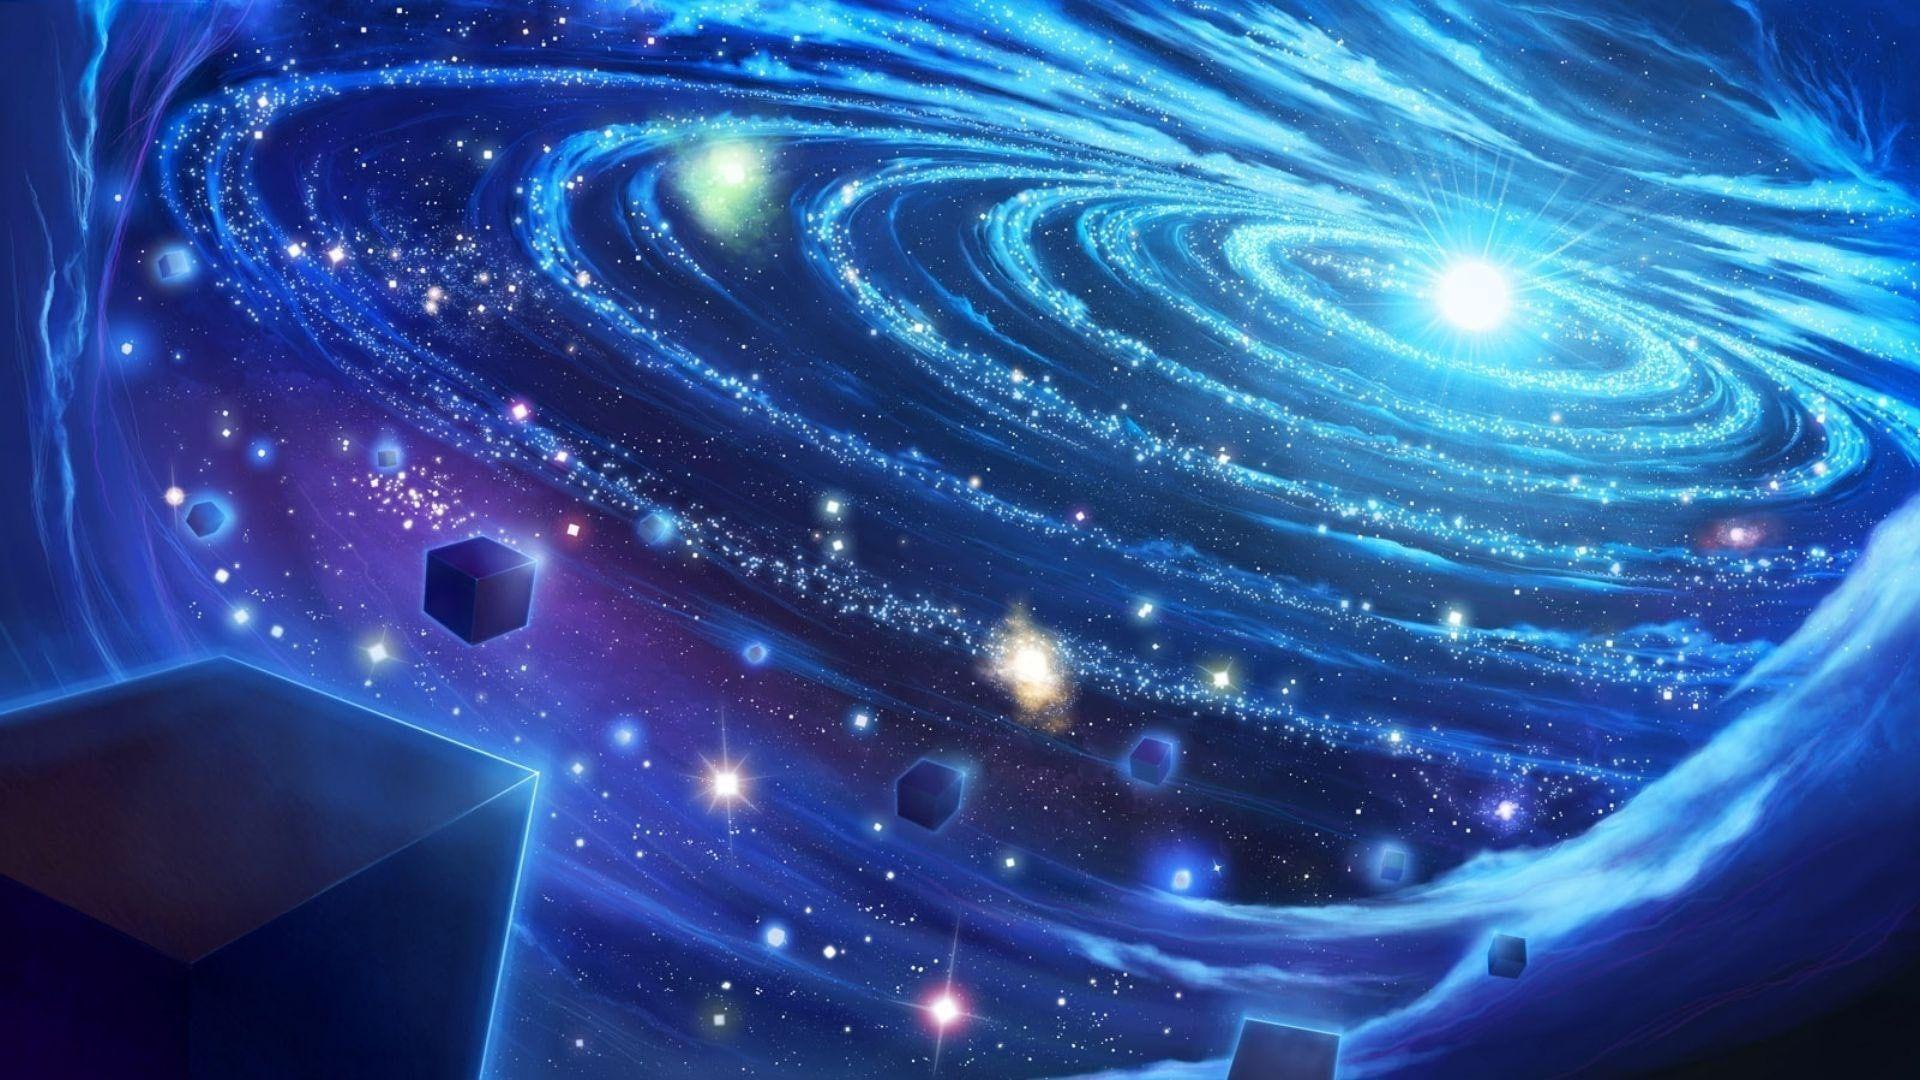 Blue Space Purple And Teal Galaxy Digital Art 1920x1080 Light Star Universe Galaxy 1080p Blue Galaxy Wallpaper Galaxy Wallpaper Galaxy Wallpaper Iphone